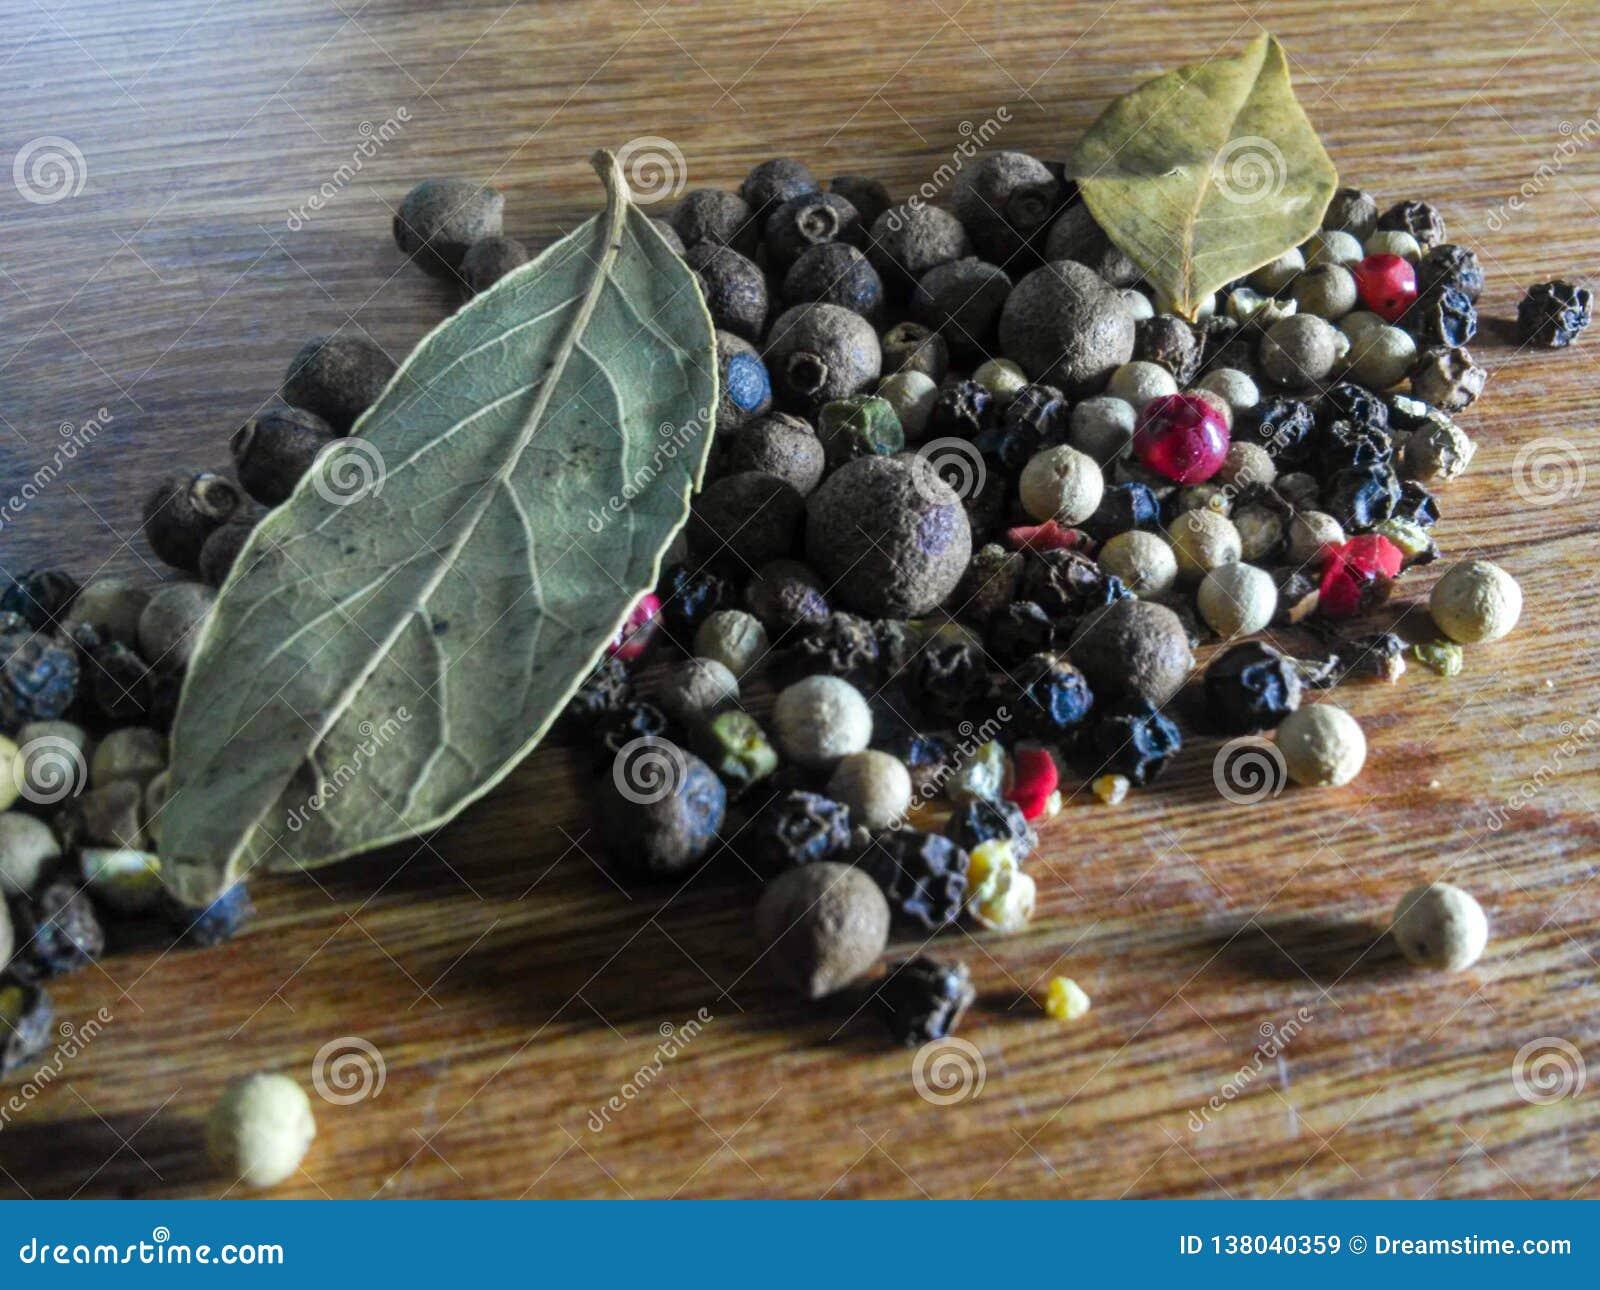 Black pepper grains Natural spice